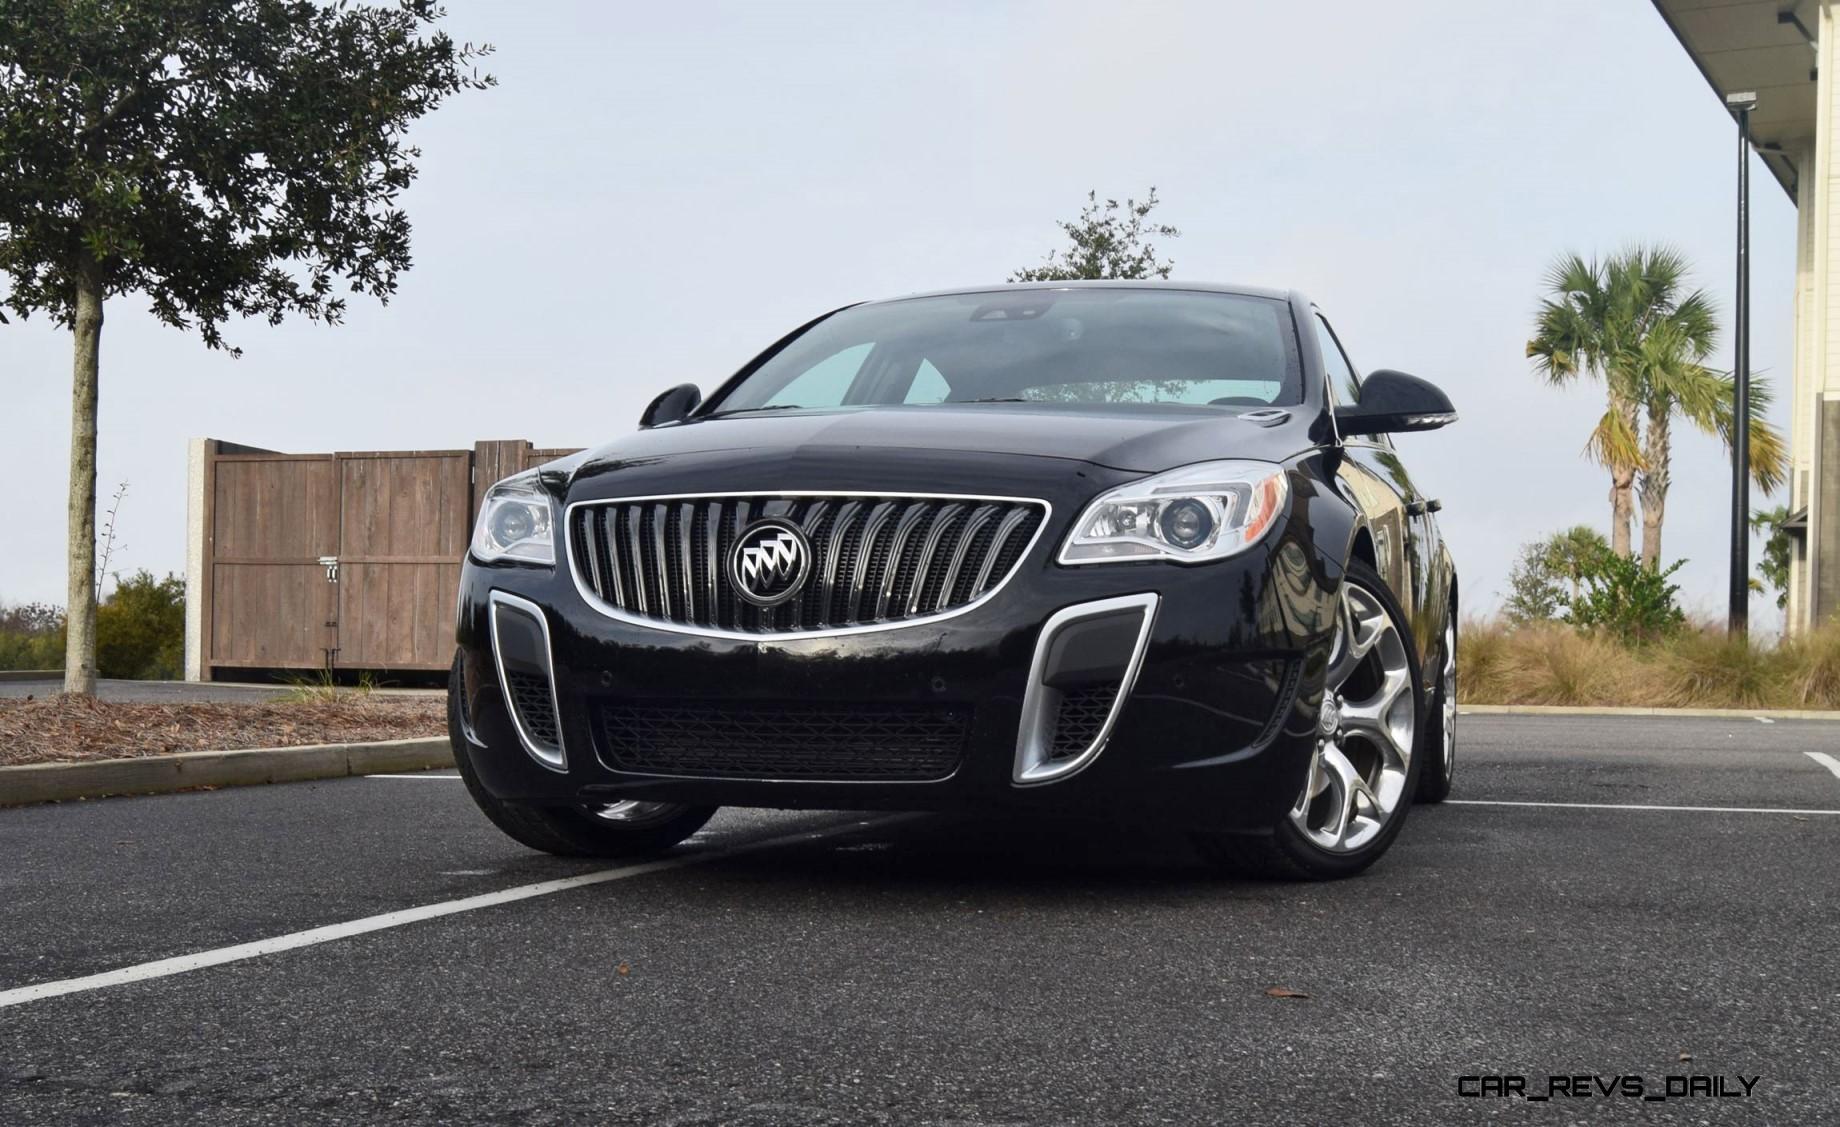 road test review 2016 buick regal gs car revs. Black Bedroom Furniture Sets. Home Design Ideas